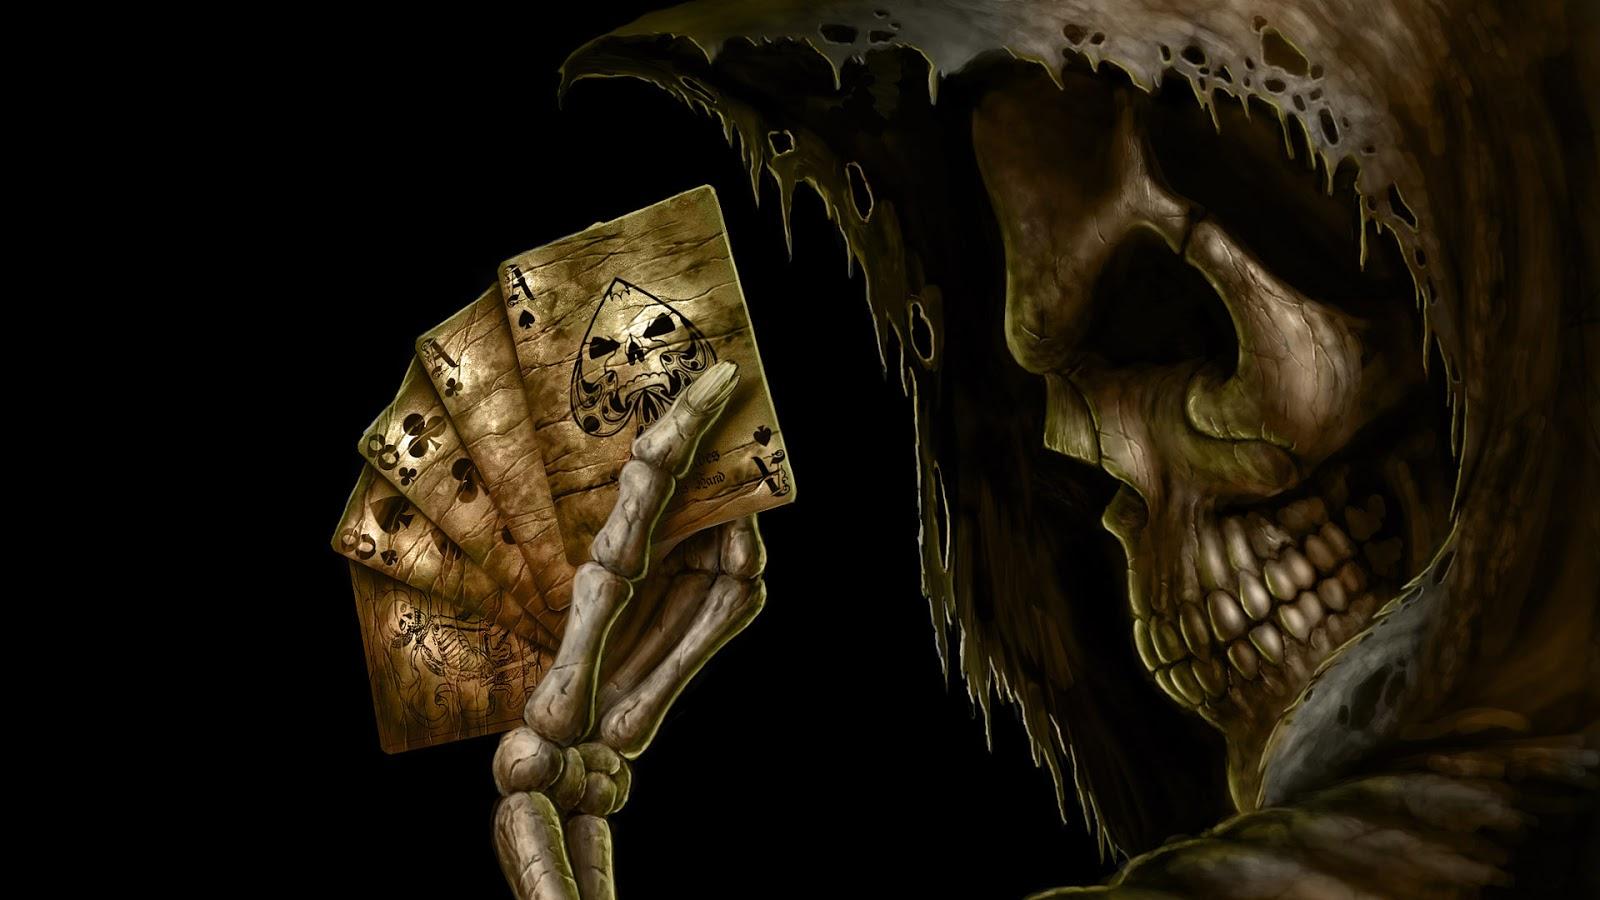 http://4.bp.blogspot.com/-Ed-QBuzrOrY/TzSQV34LqlI/AAAAAAAADHo/8AmyTb16-i4/s1600/a-caveira-e-o-baralho-da-morte.jpg